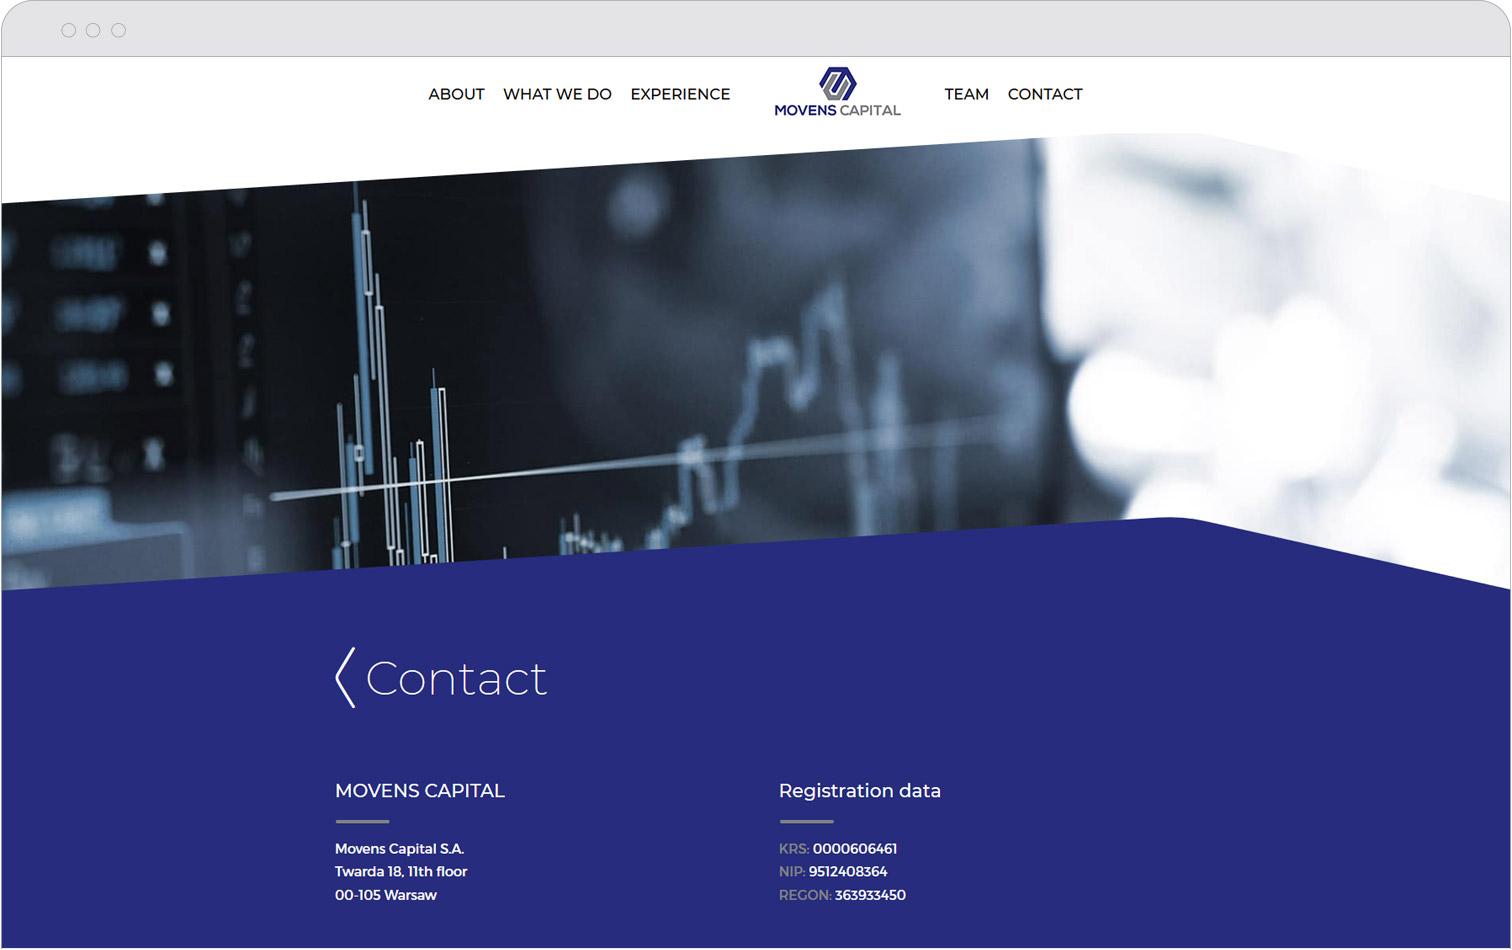 Sekcja Contact nastronie internetowej Movens Capital